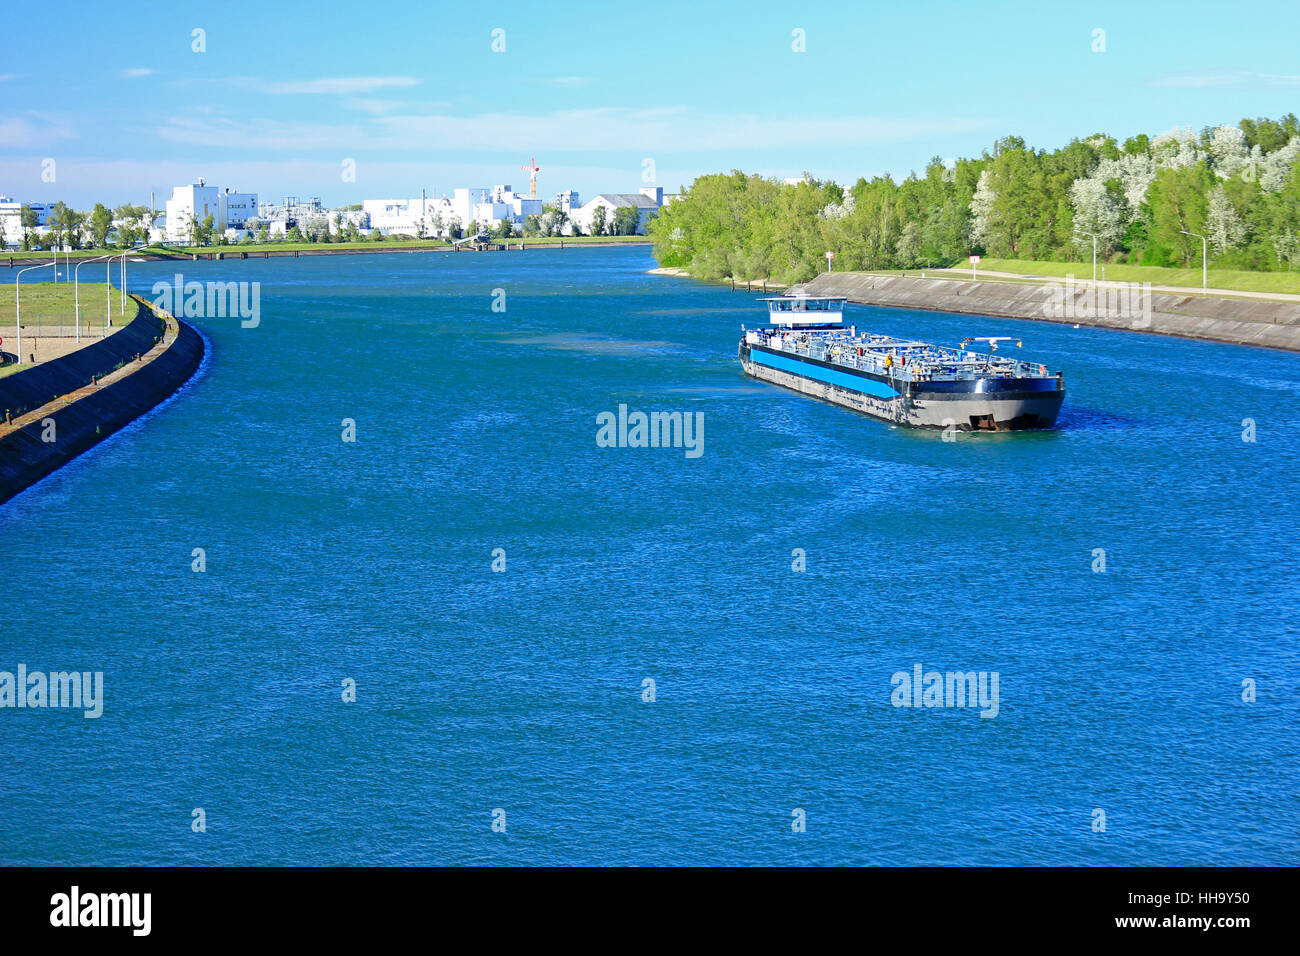 cargo ship on the rhine - Stock Image